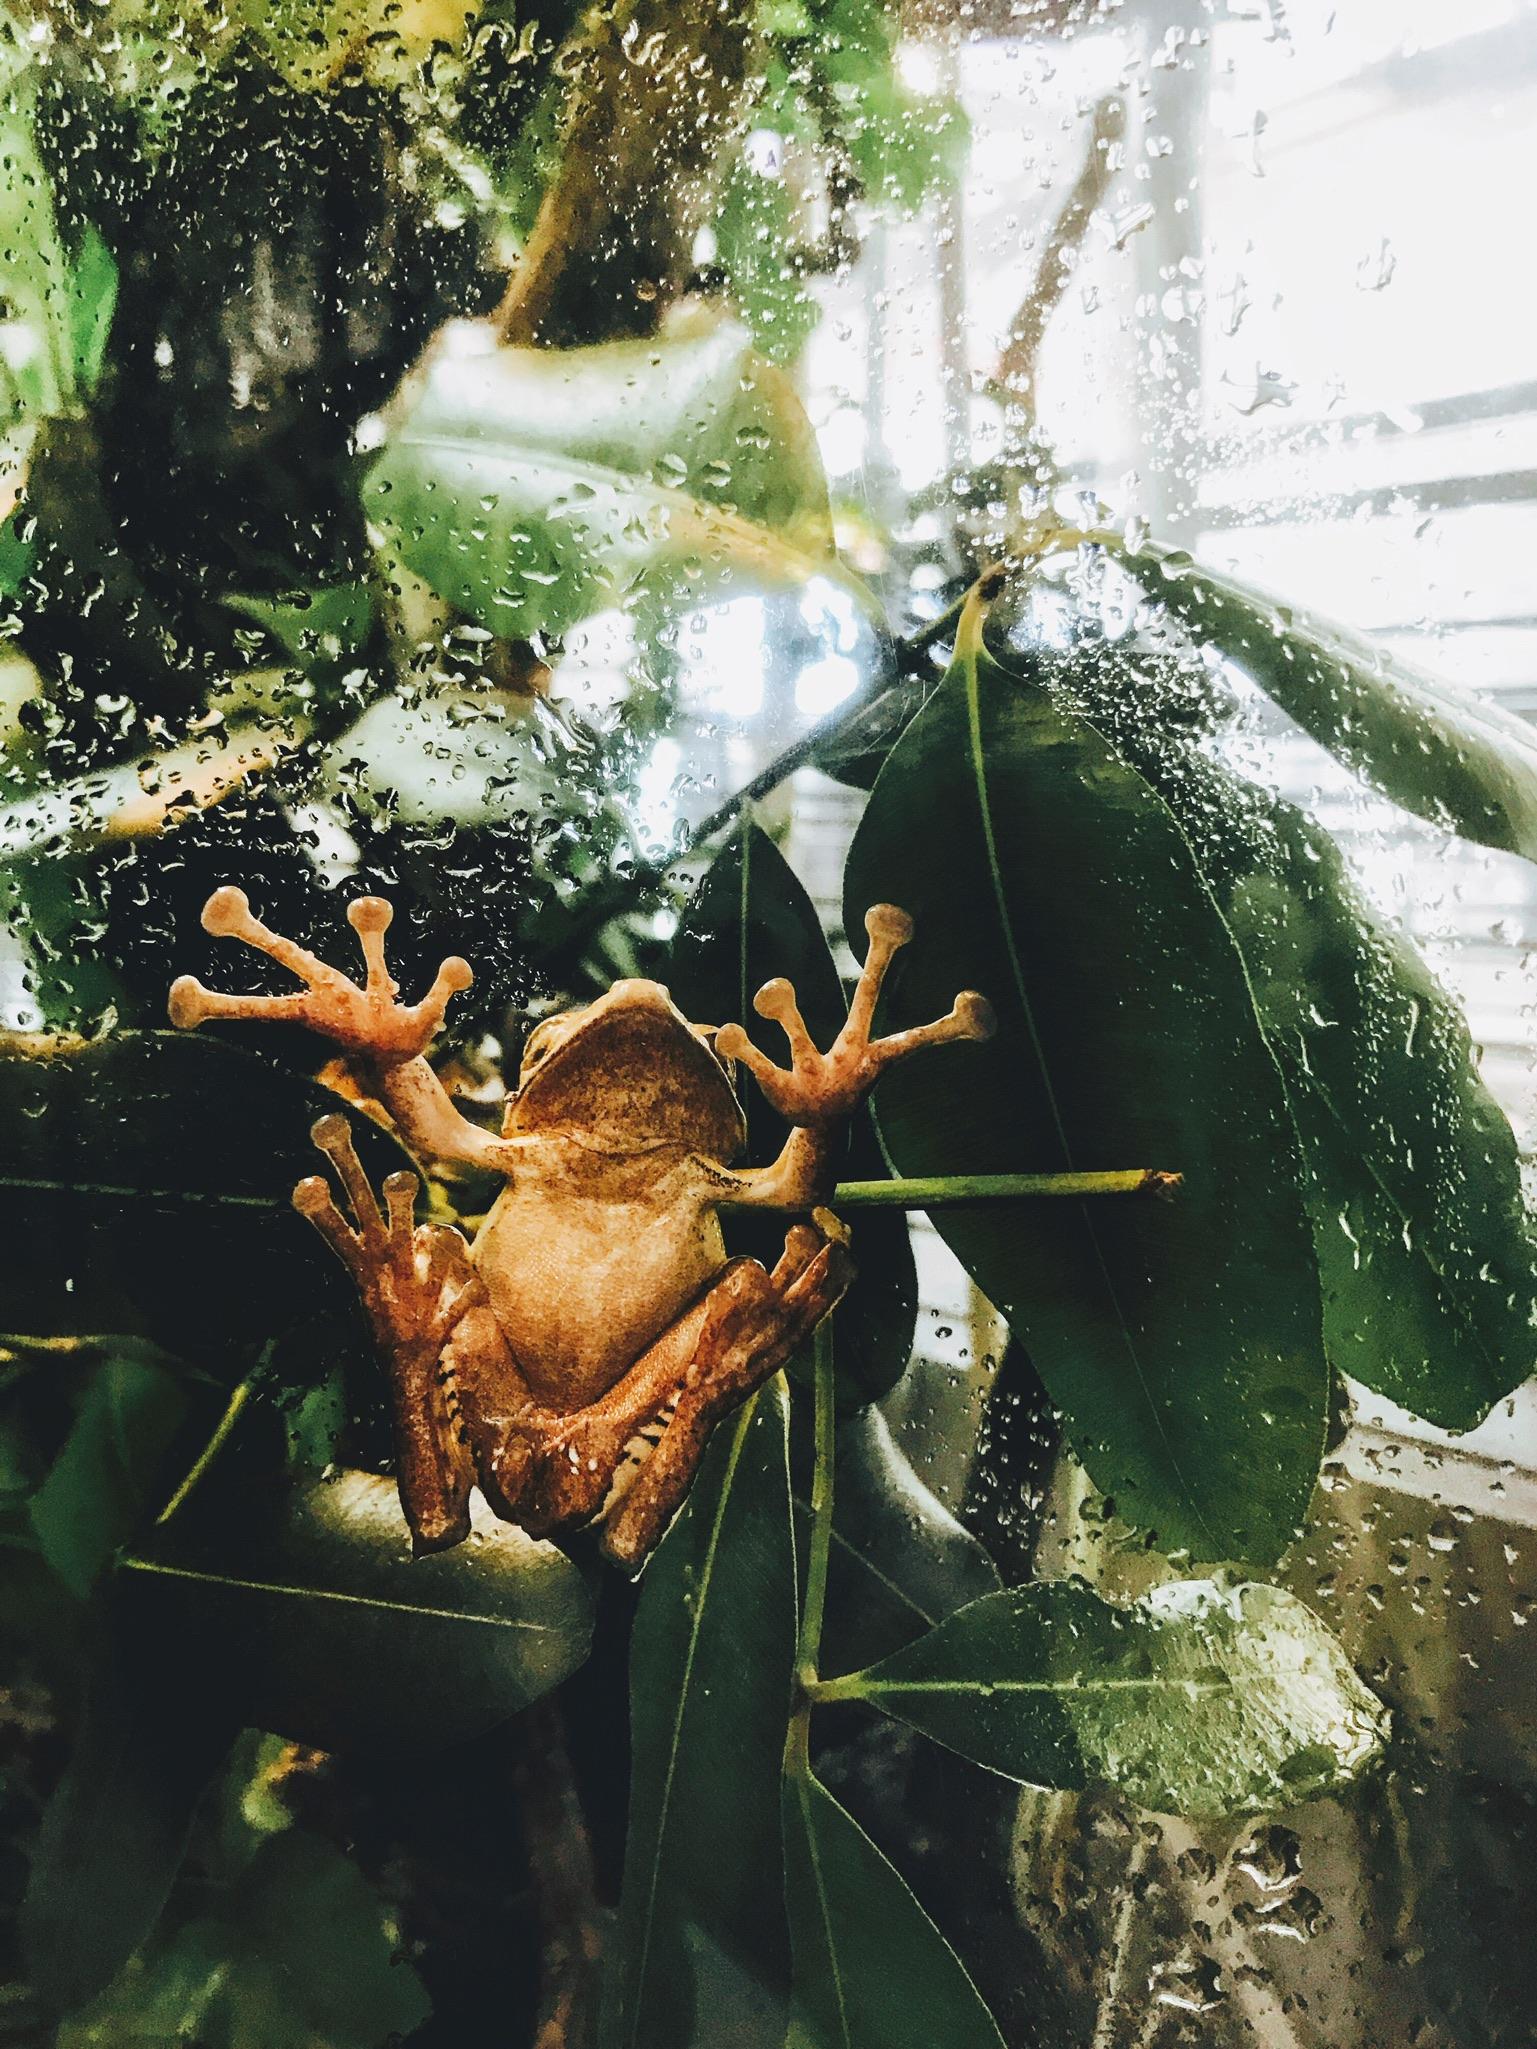 frog-photo-beneath.JPG